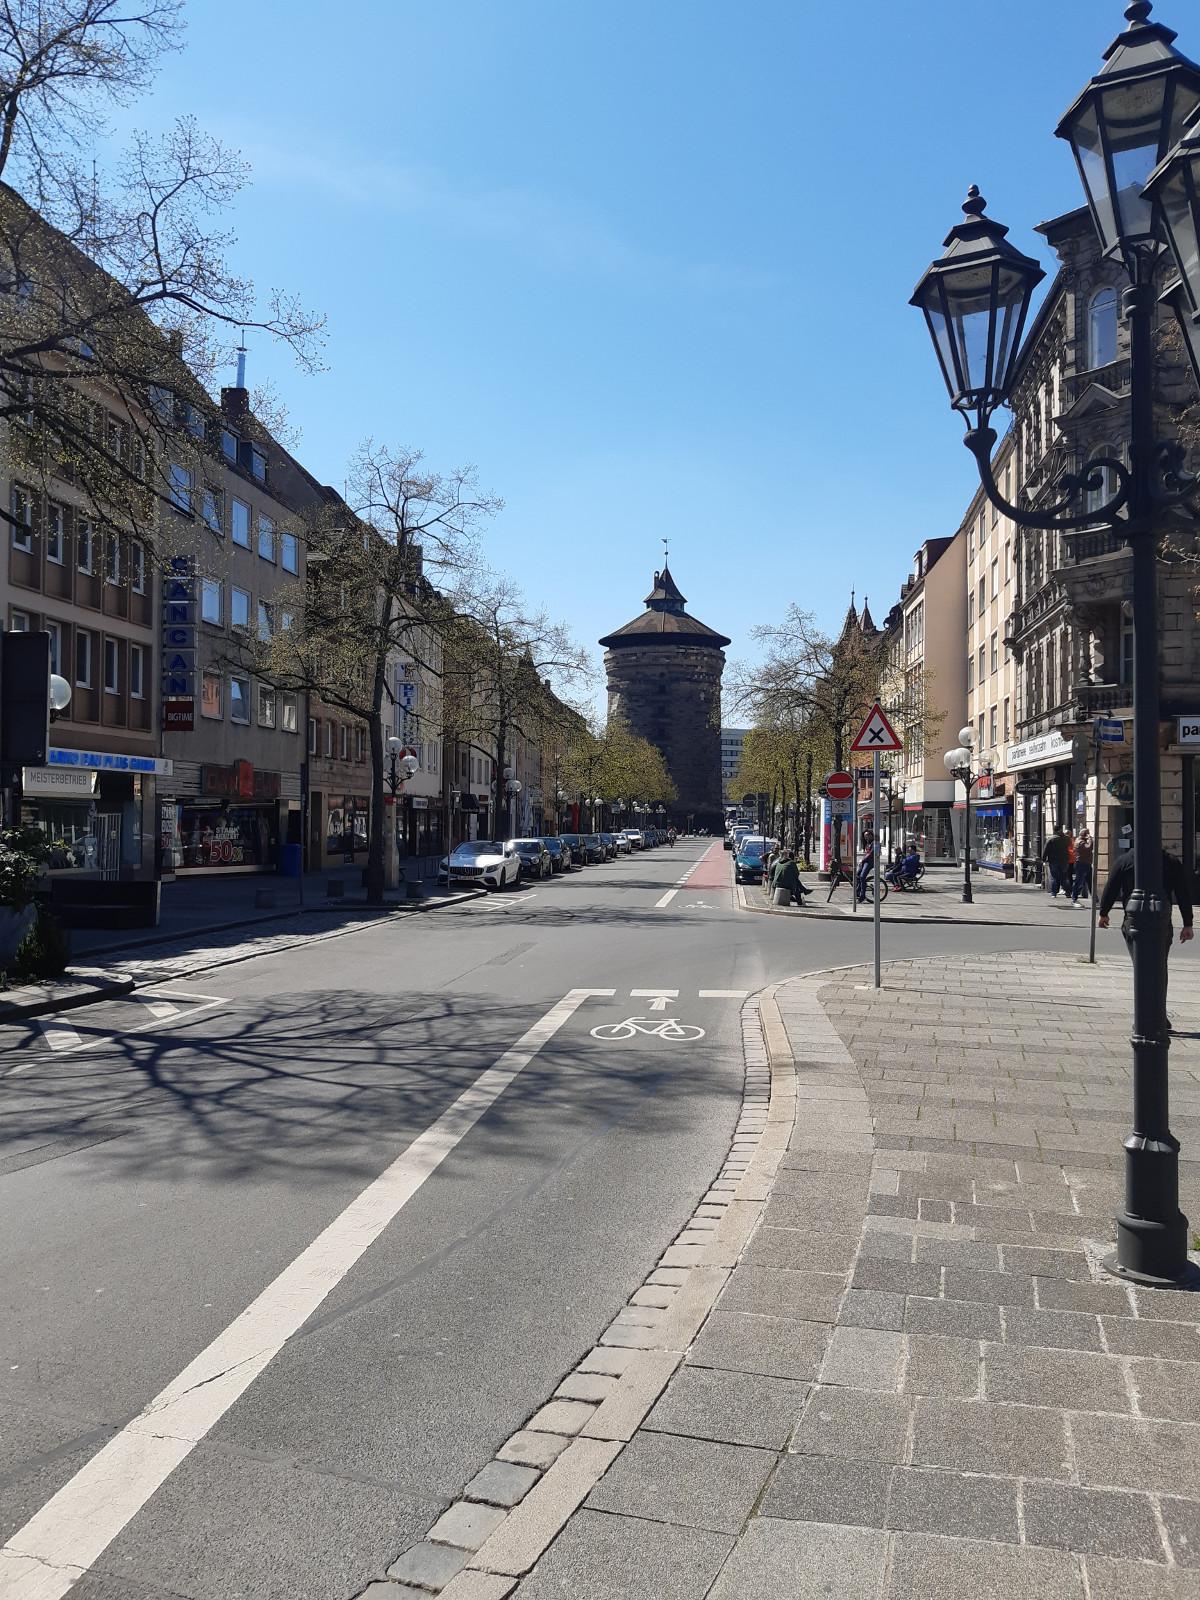 2021-05-01-04-06-16-4Ludwigstrasse.jpg - Atelier Haberbosch Nürnberg